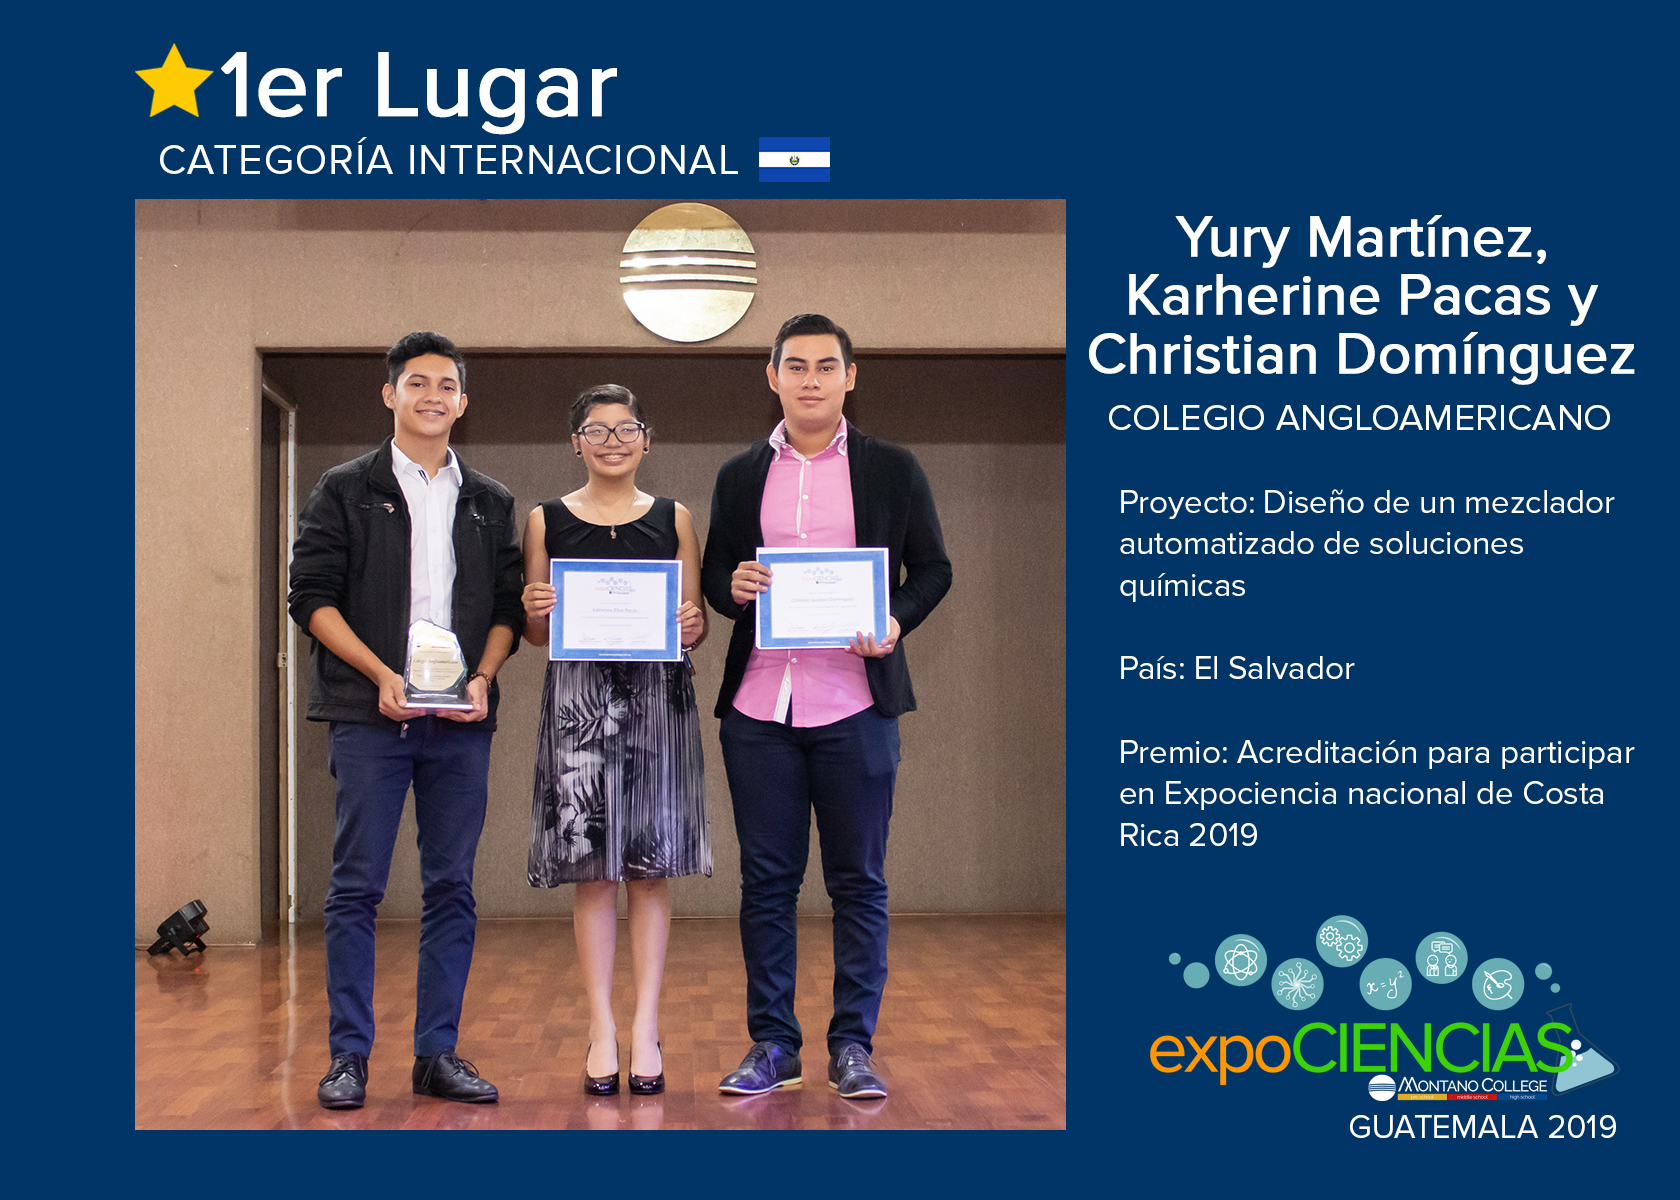 PRIMER LUGAR:  YURY MARTÍNEZ, KATHERINE PACAS Y CHRISTIAN DOMÍNGUEZ